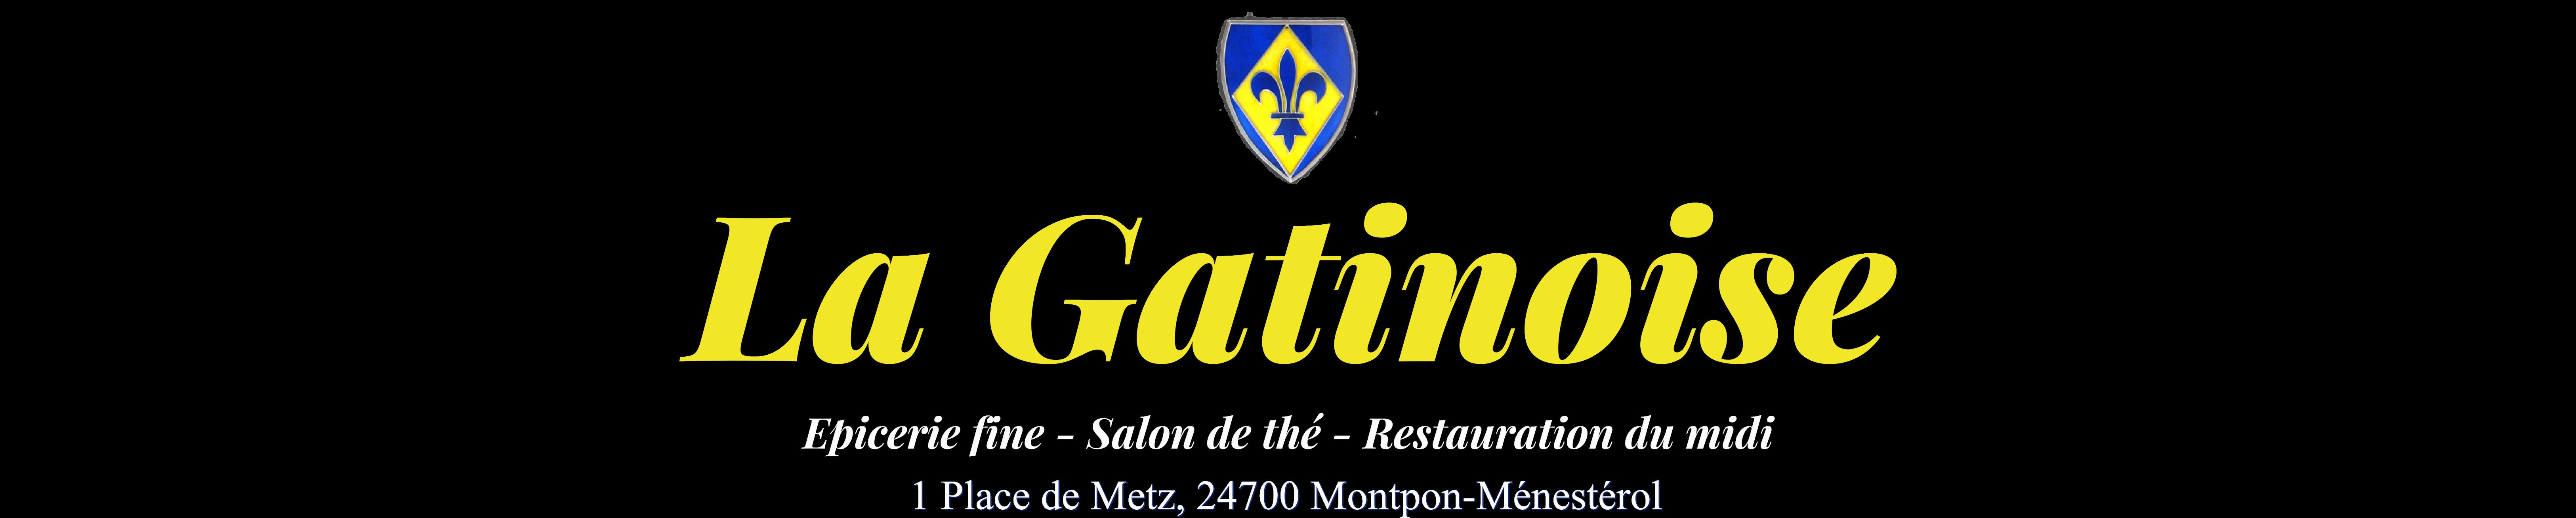 La Gatinoise